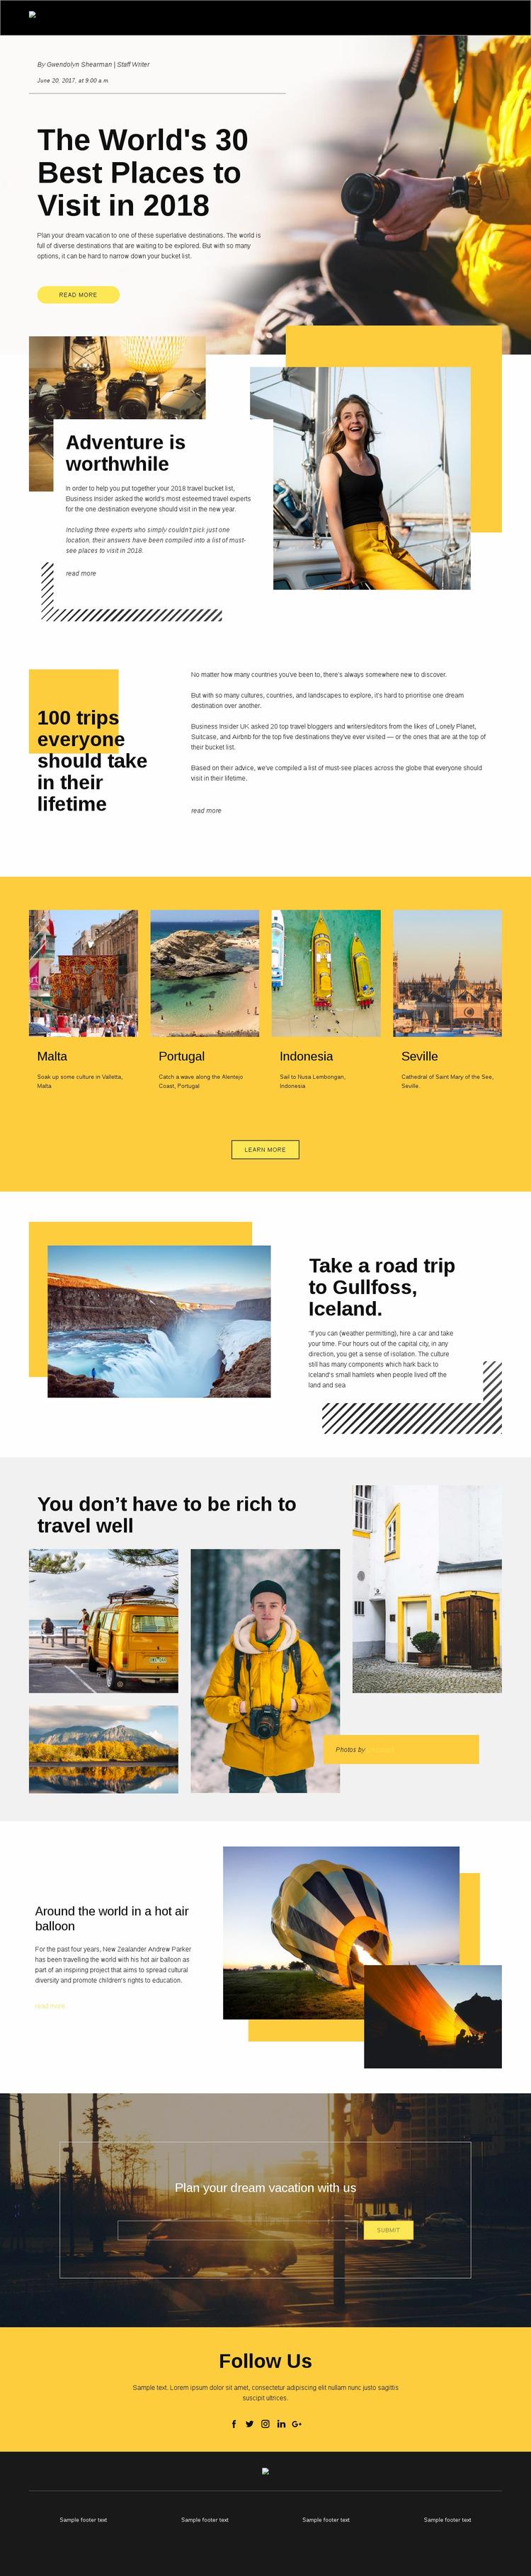 Best Places to Visit Website Builder Templates